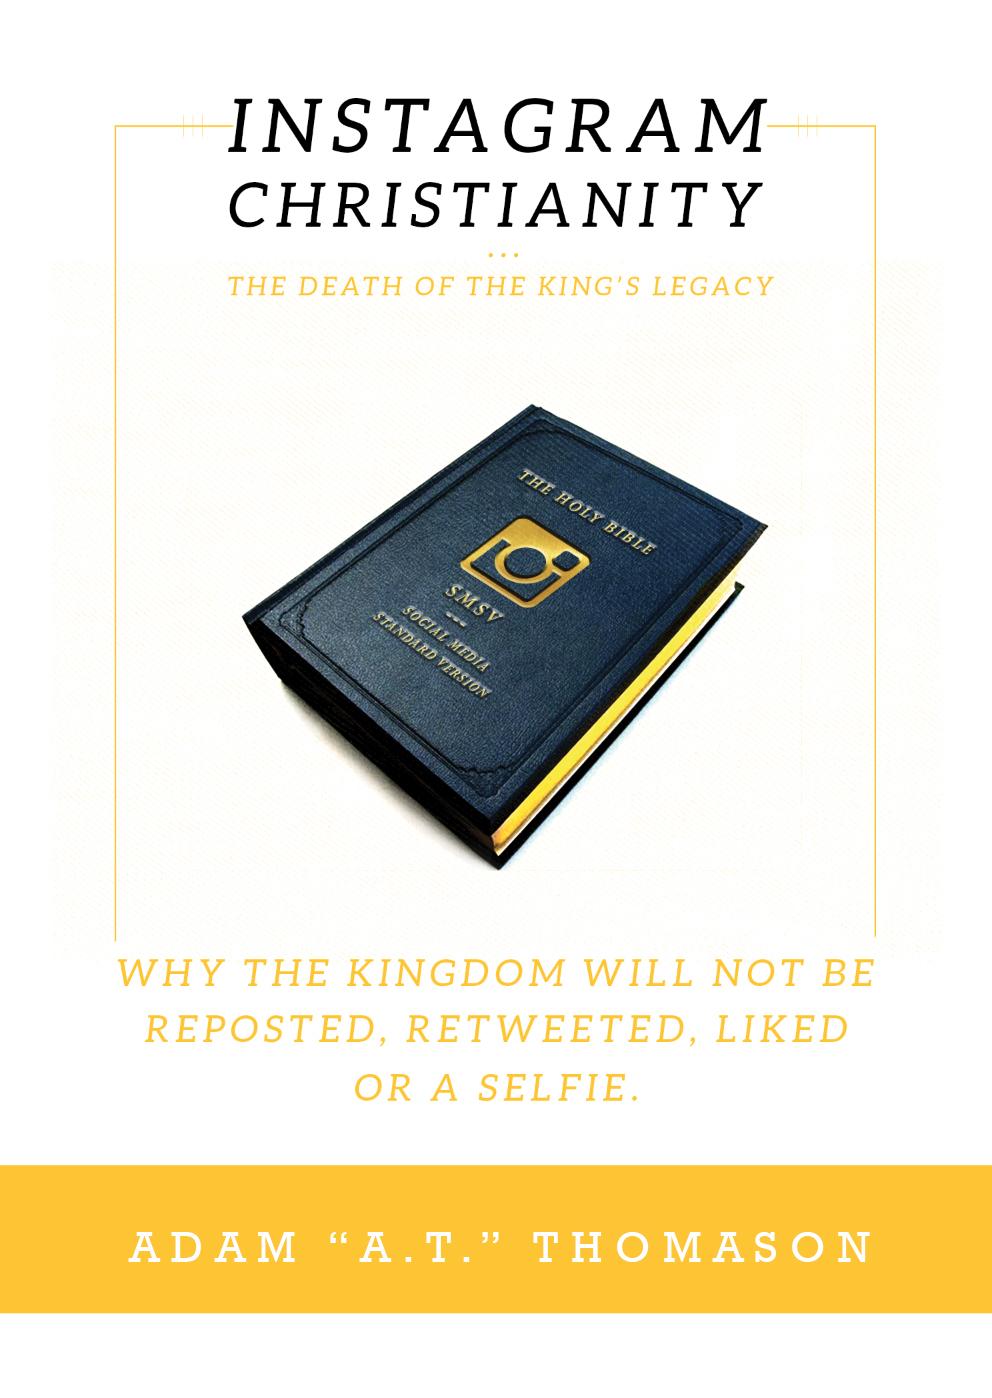 INSTA-CHRIST.jpg